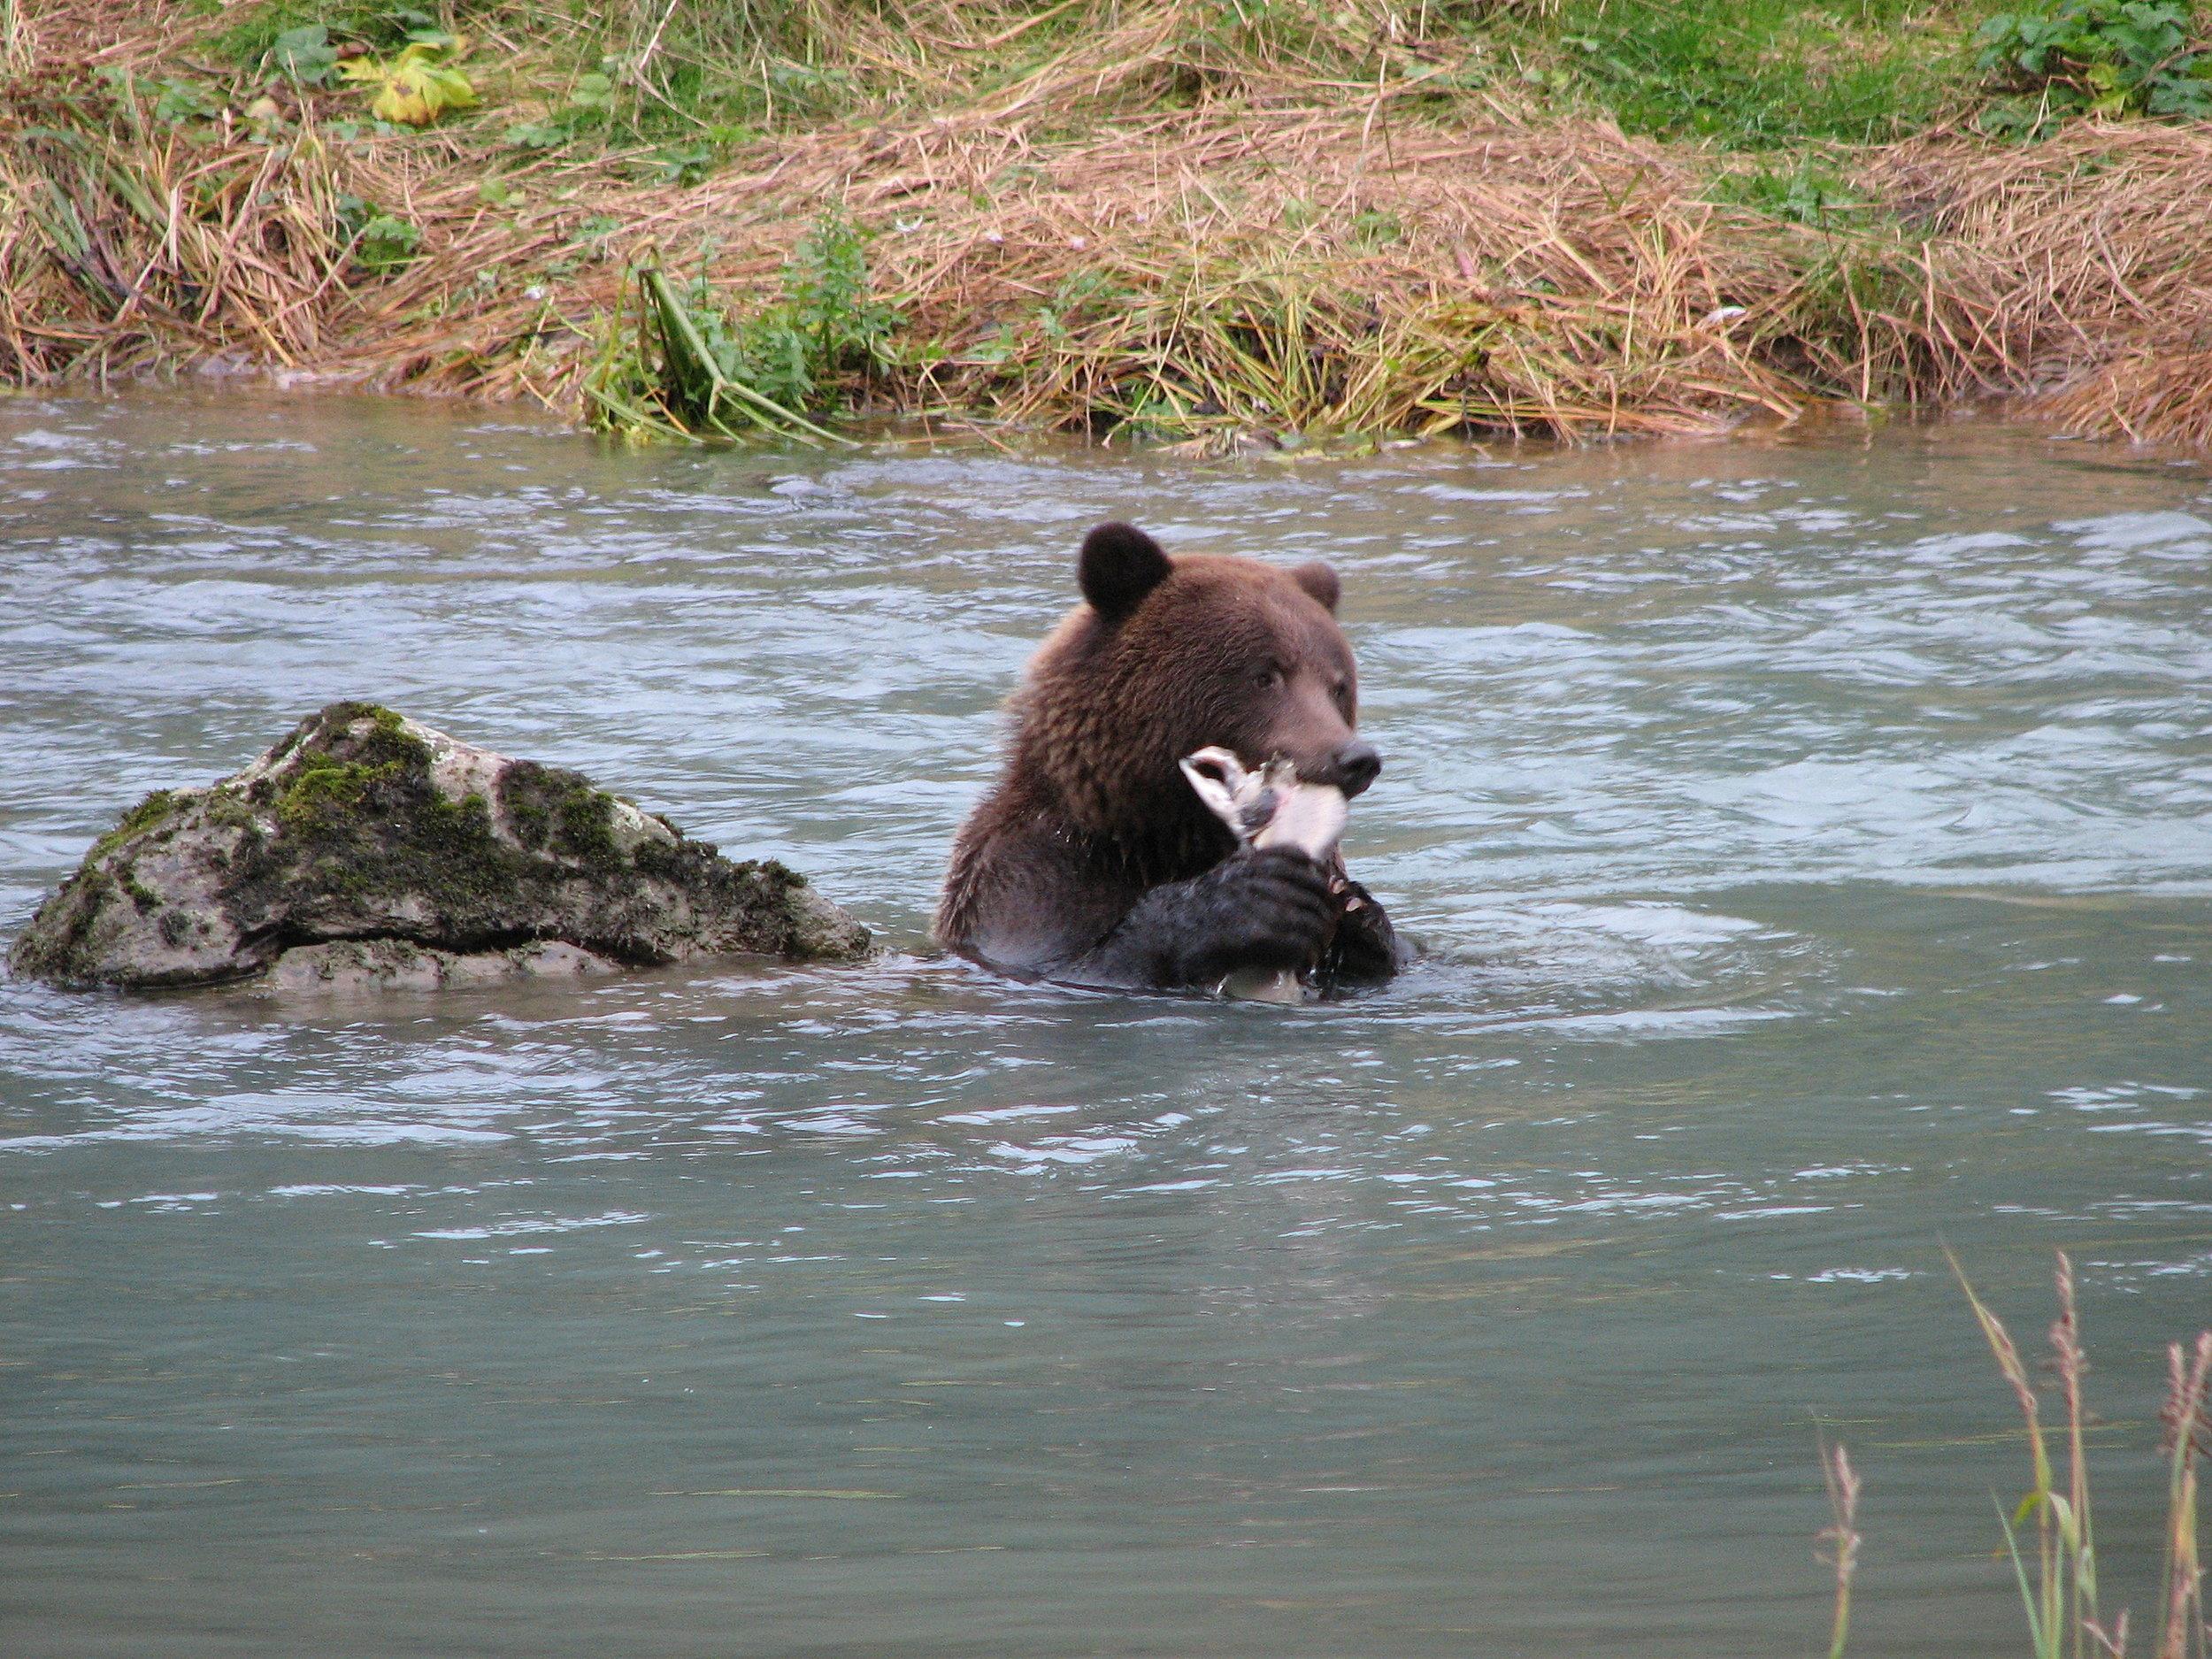 Brown bear feasting on salmon Chilkoot River near Haines, Alaska